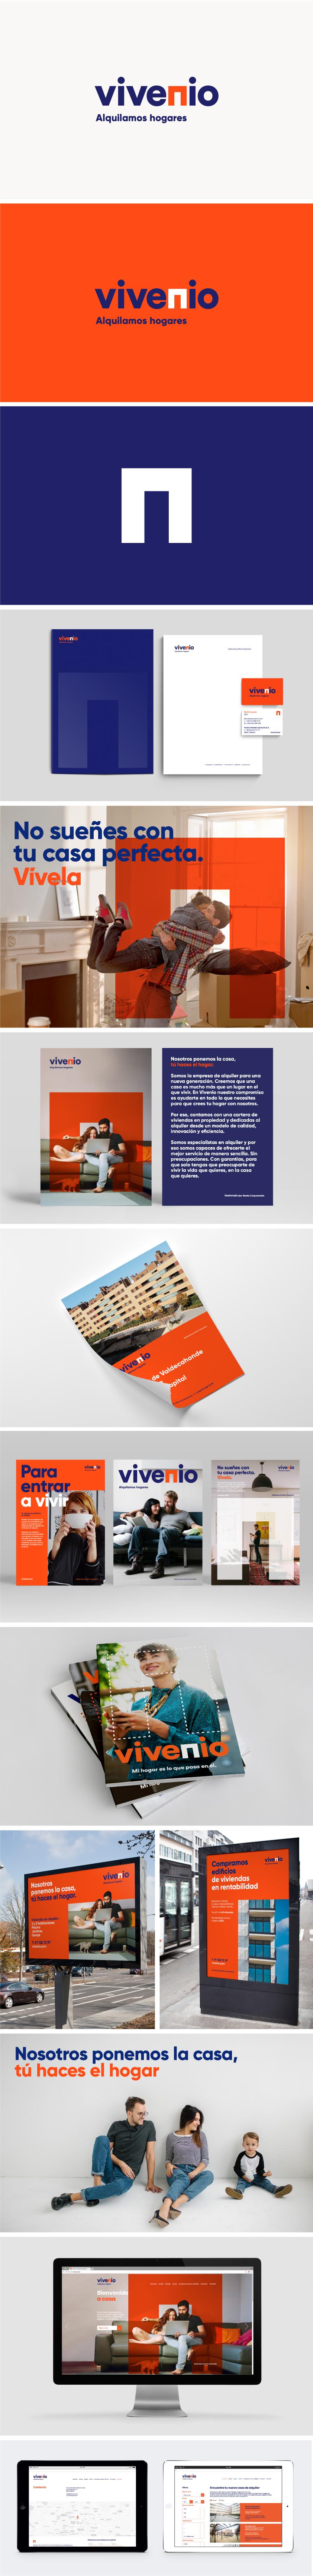 Diseño_CASE_Vivenio.jpg